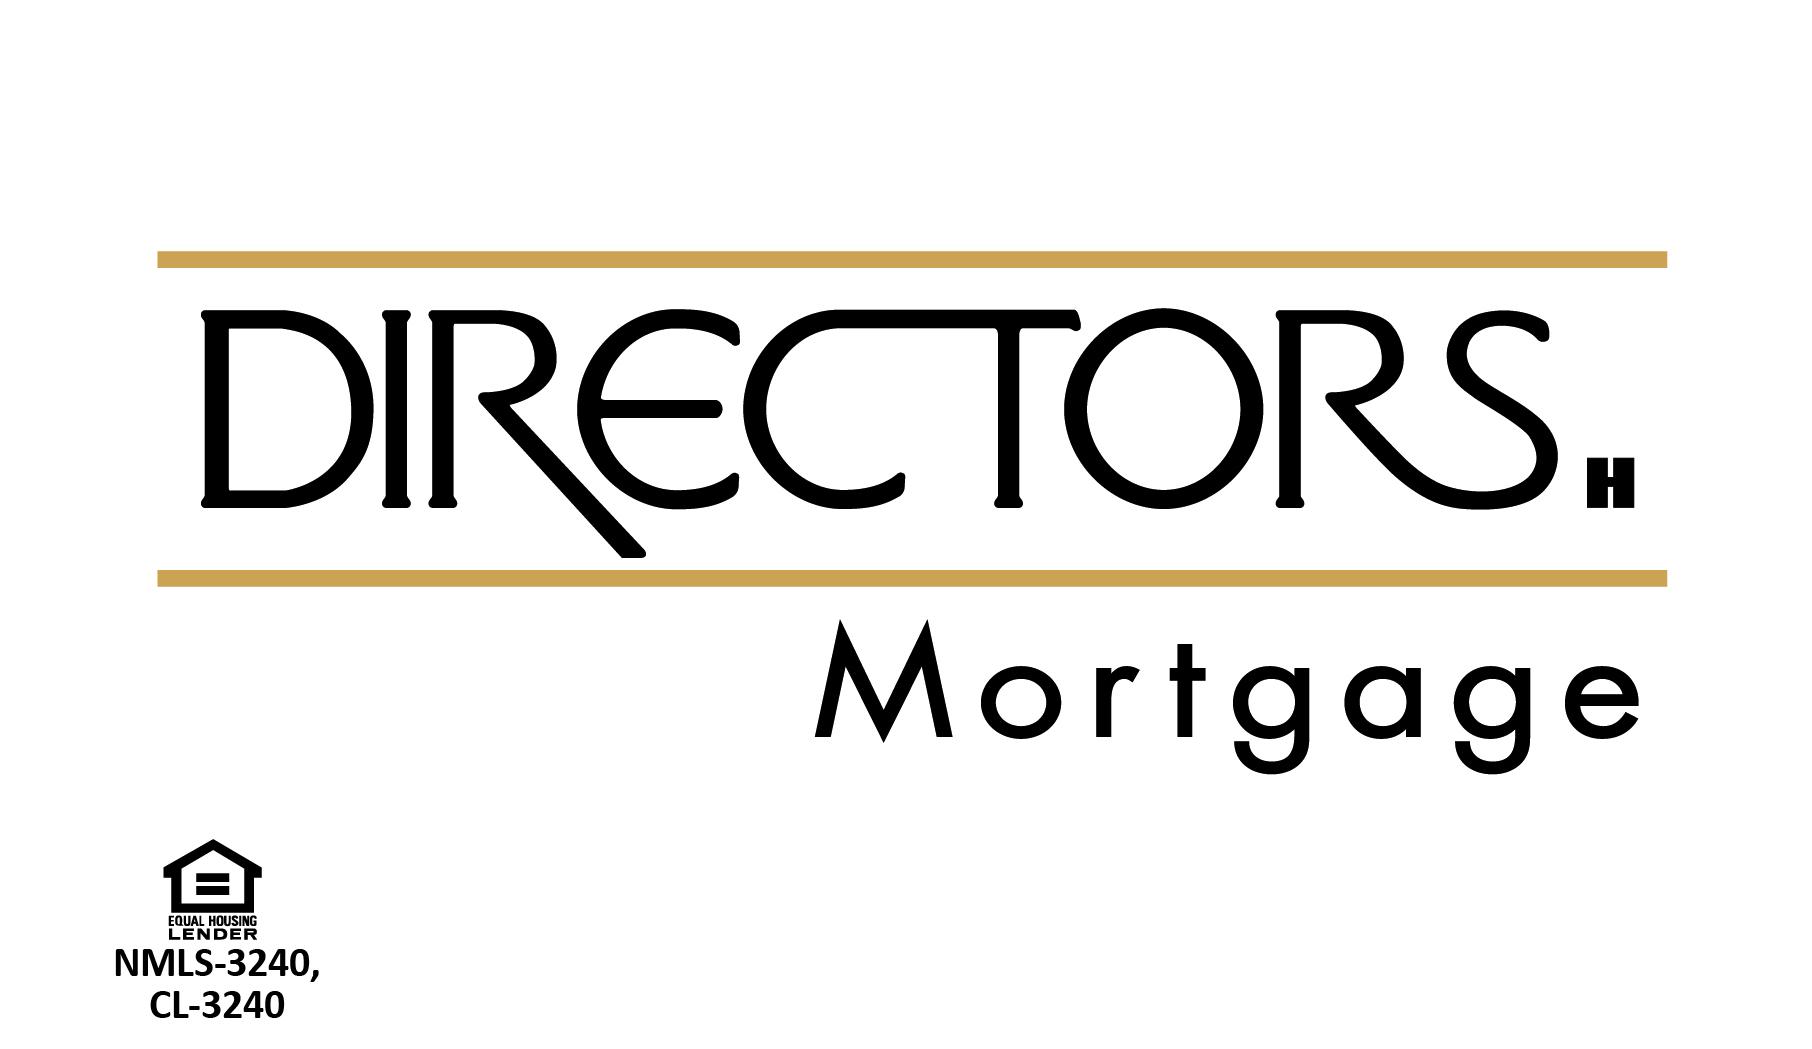 Directors Mortgage Logo_Sponsorship-02.jpg